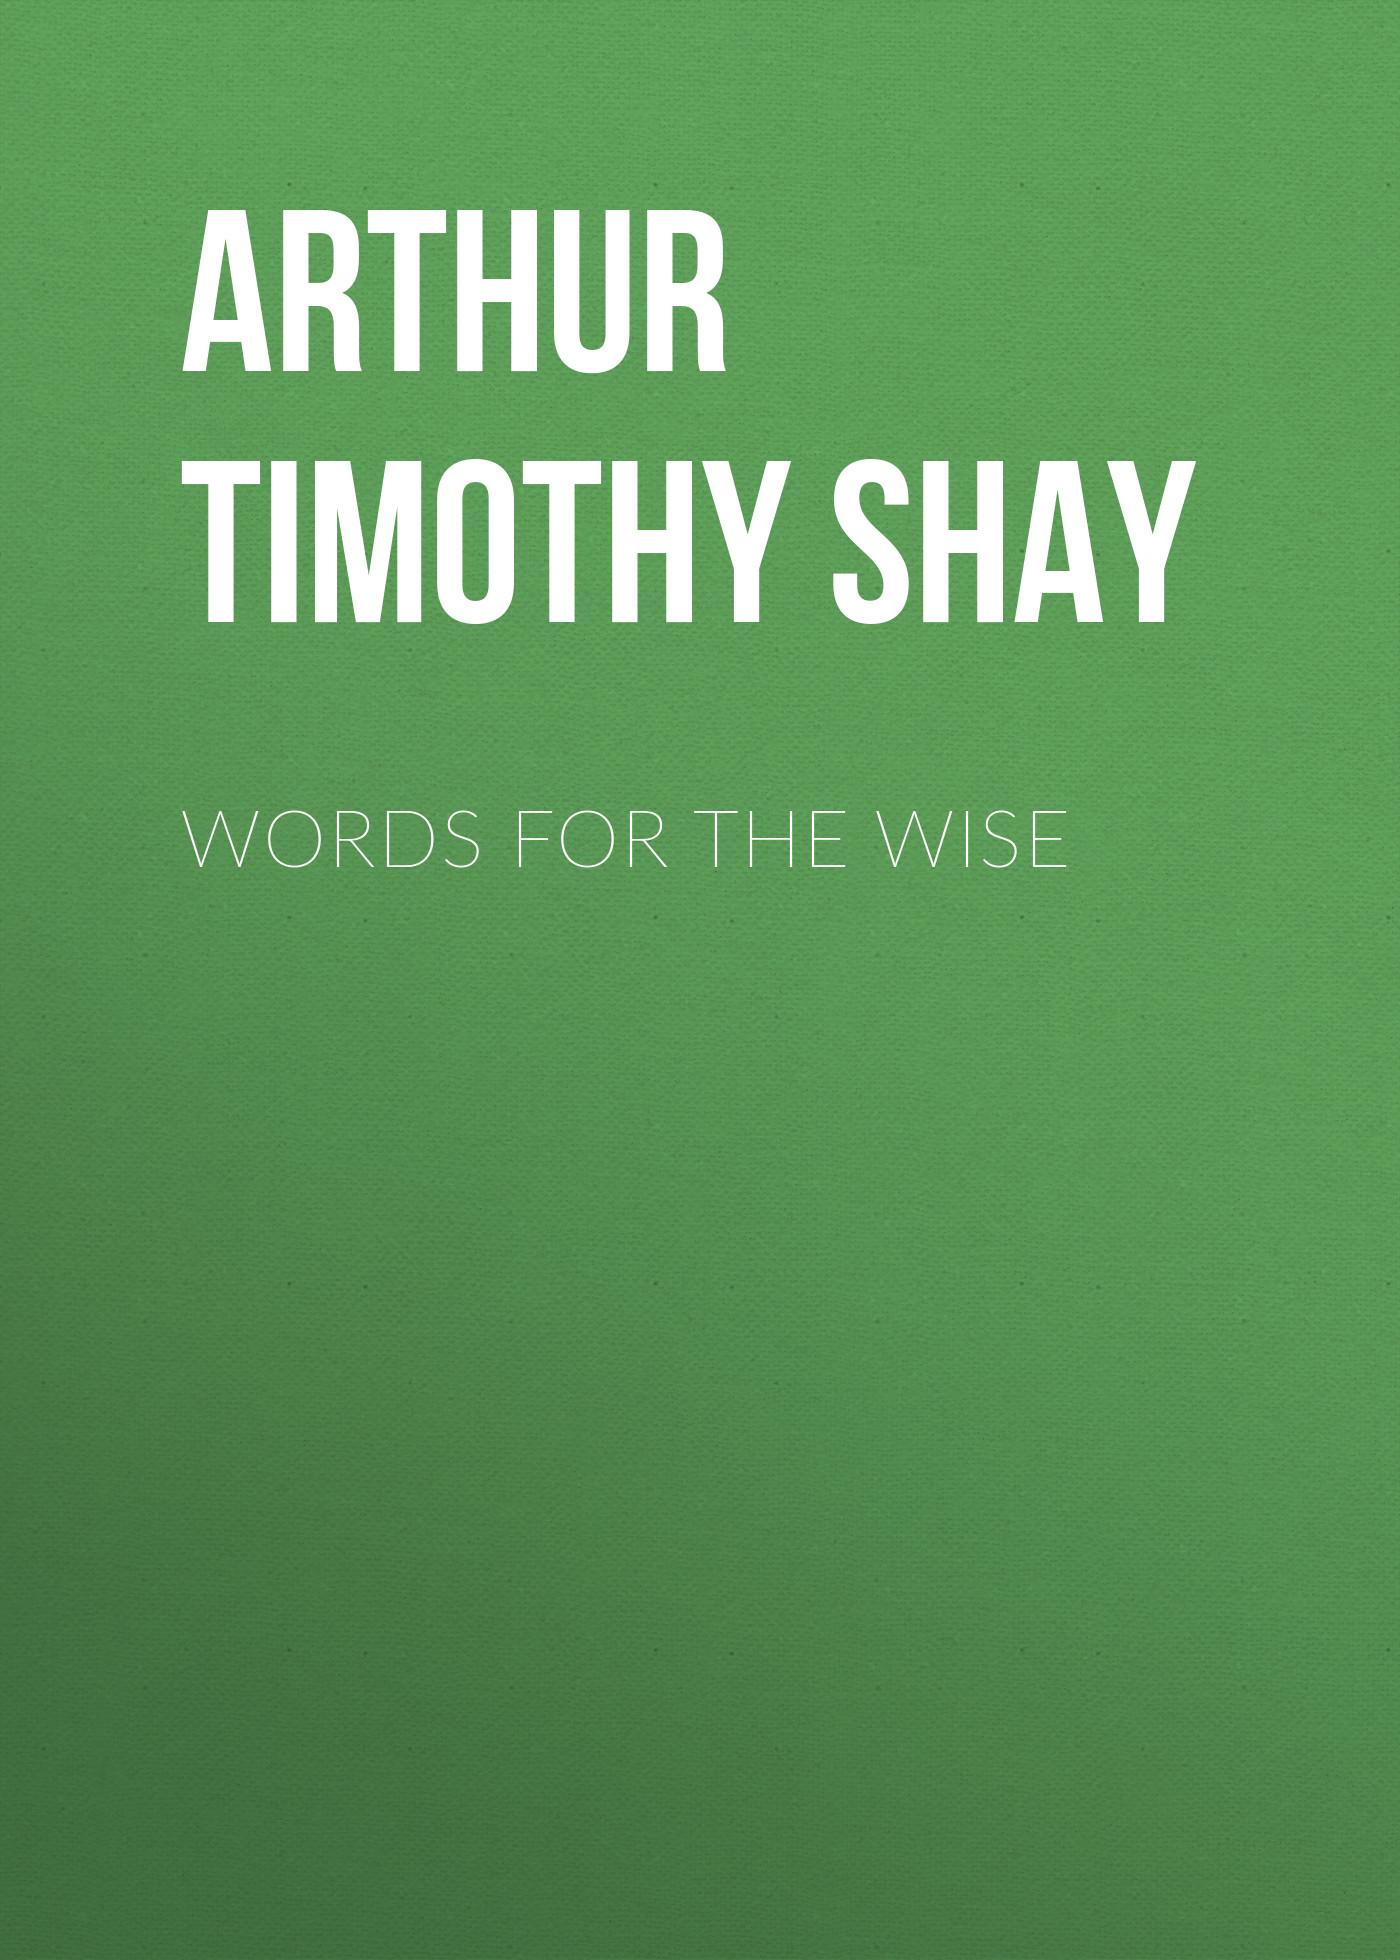 Arthur Timothy Shay Words for the Wise цена в Москве и Питере